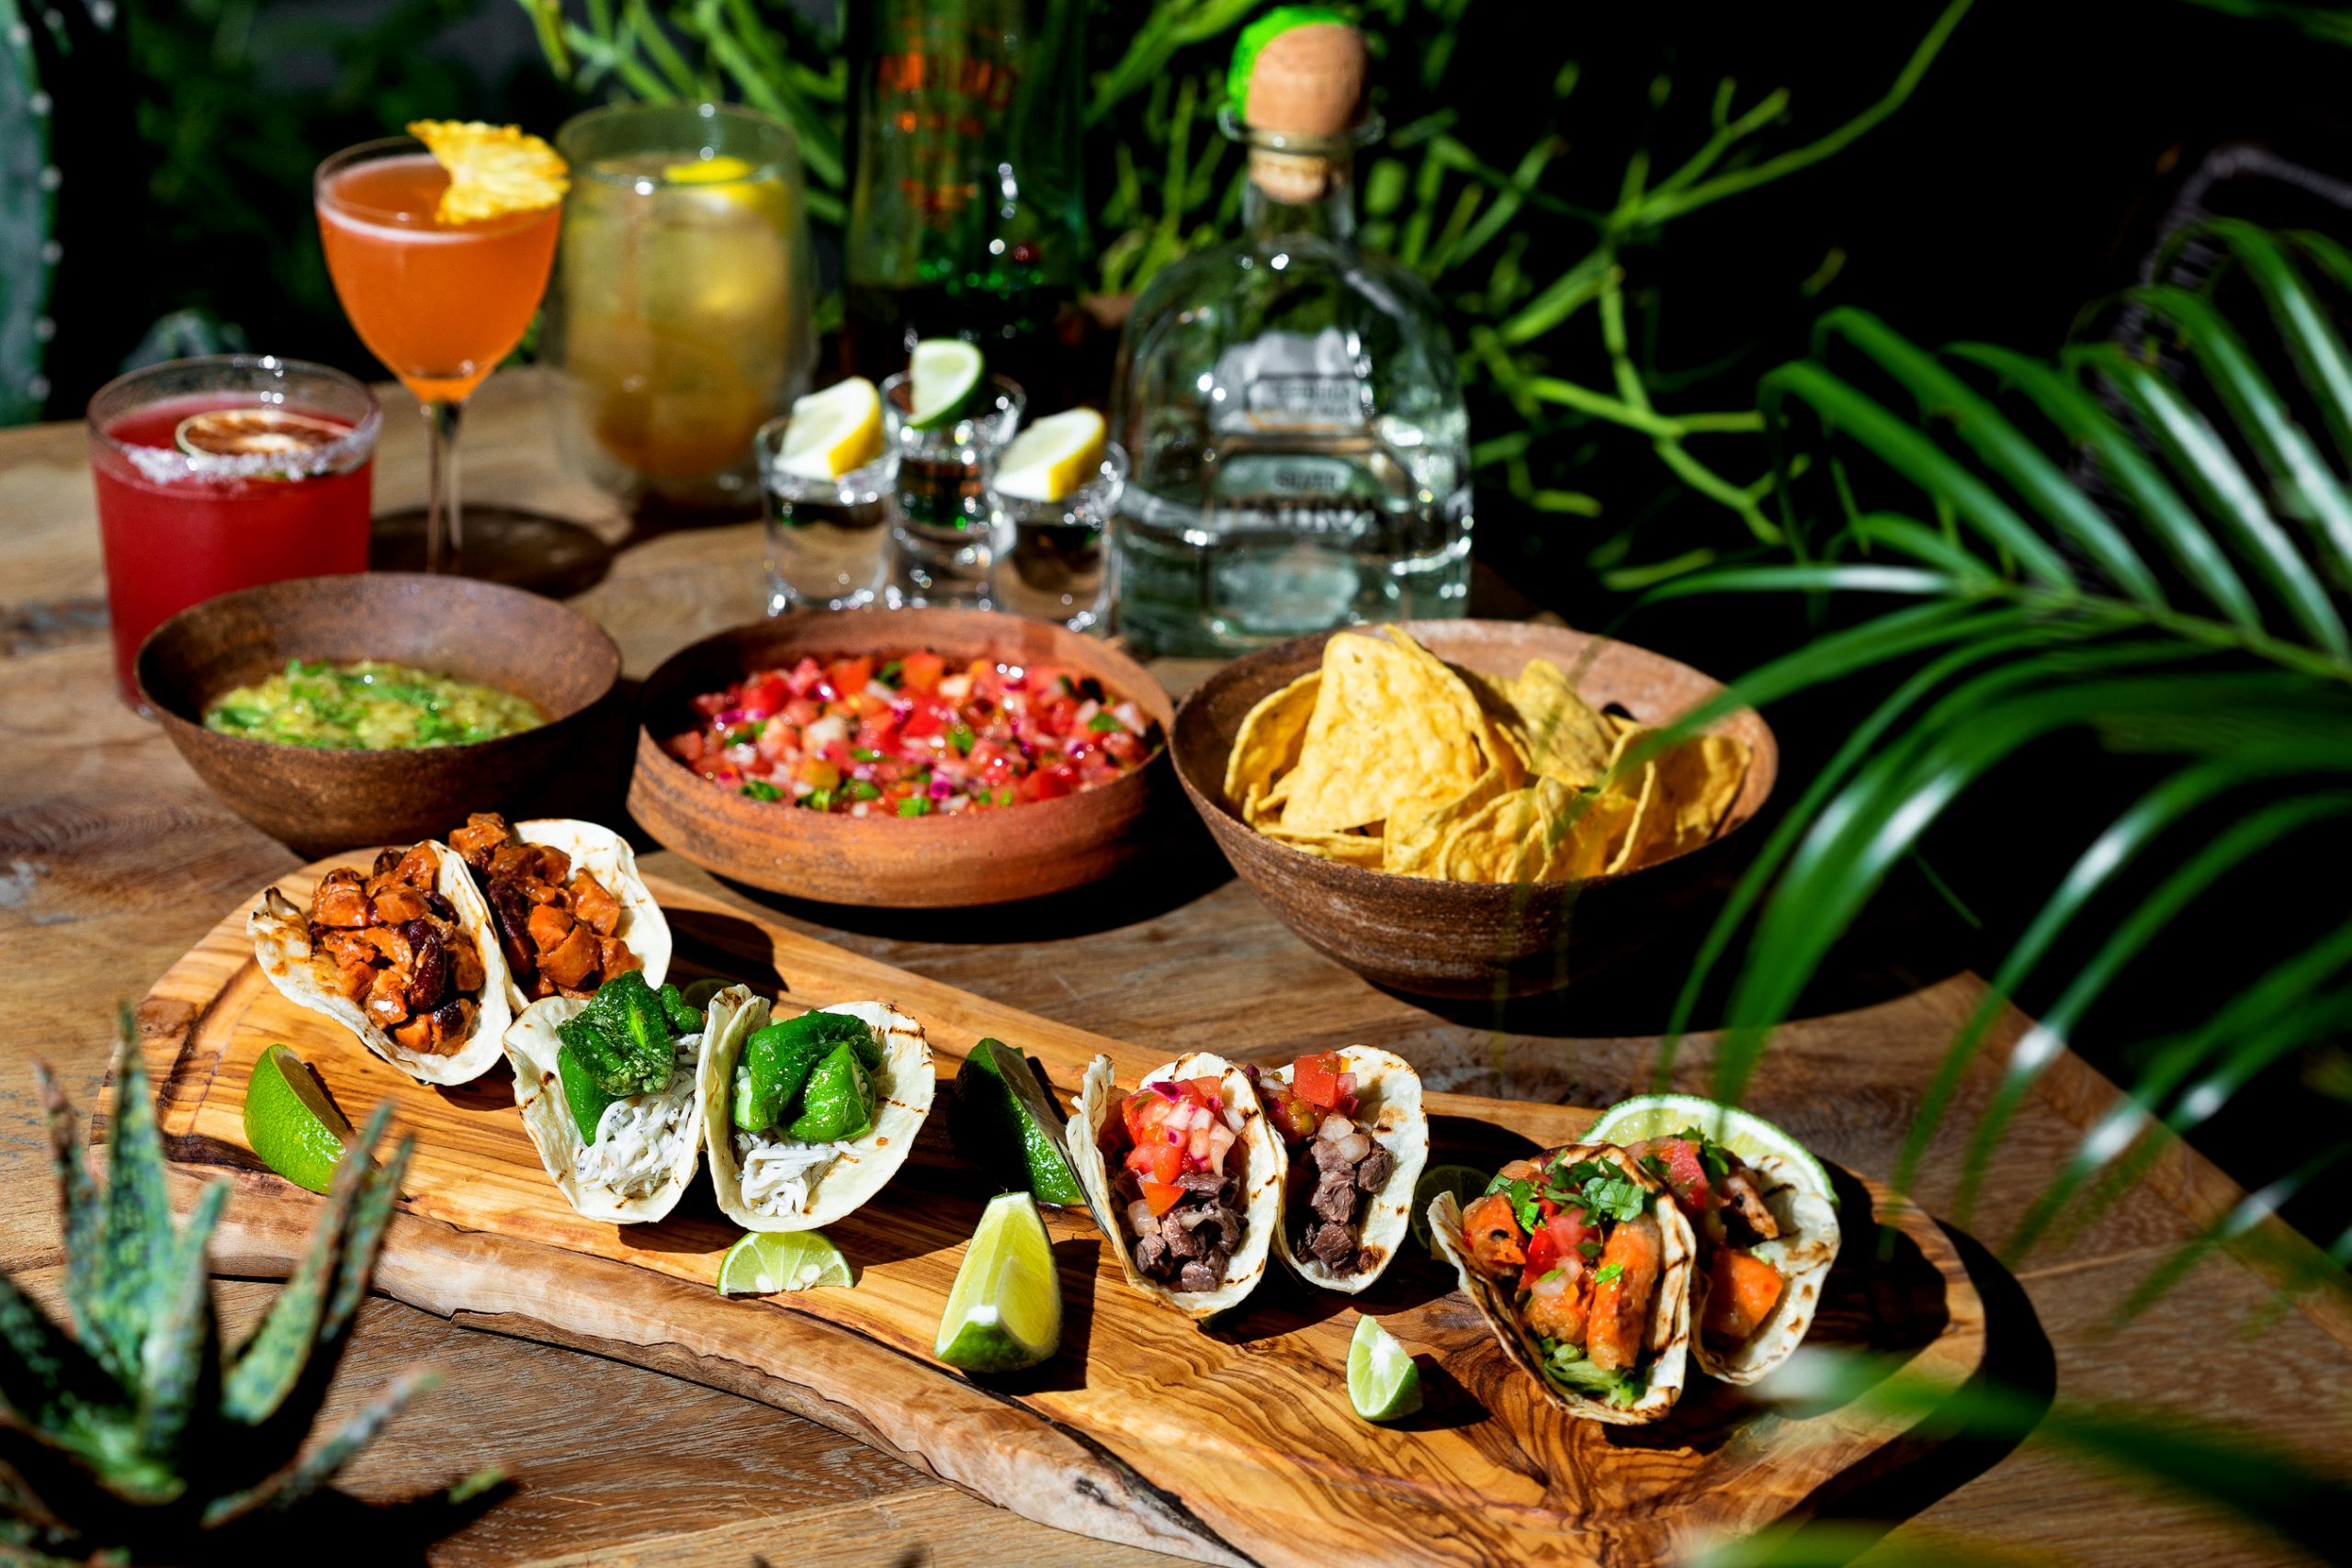 fiesta de taco shibuya trunk kitchen trunk hotel summer seasonal menu mexican food